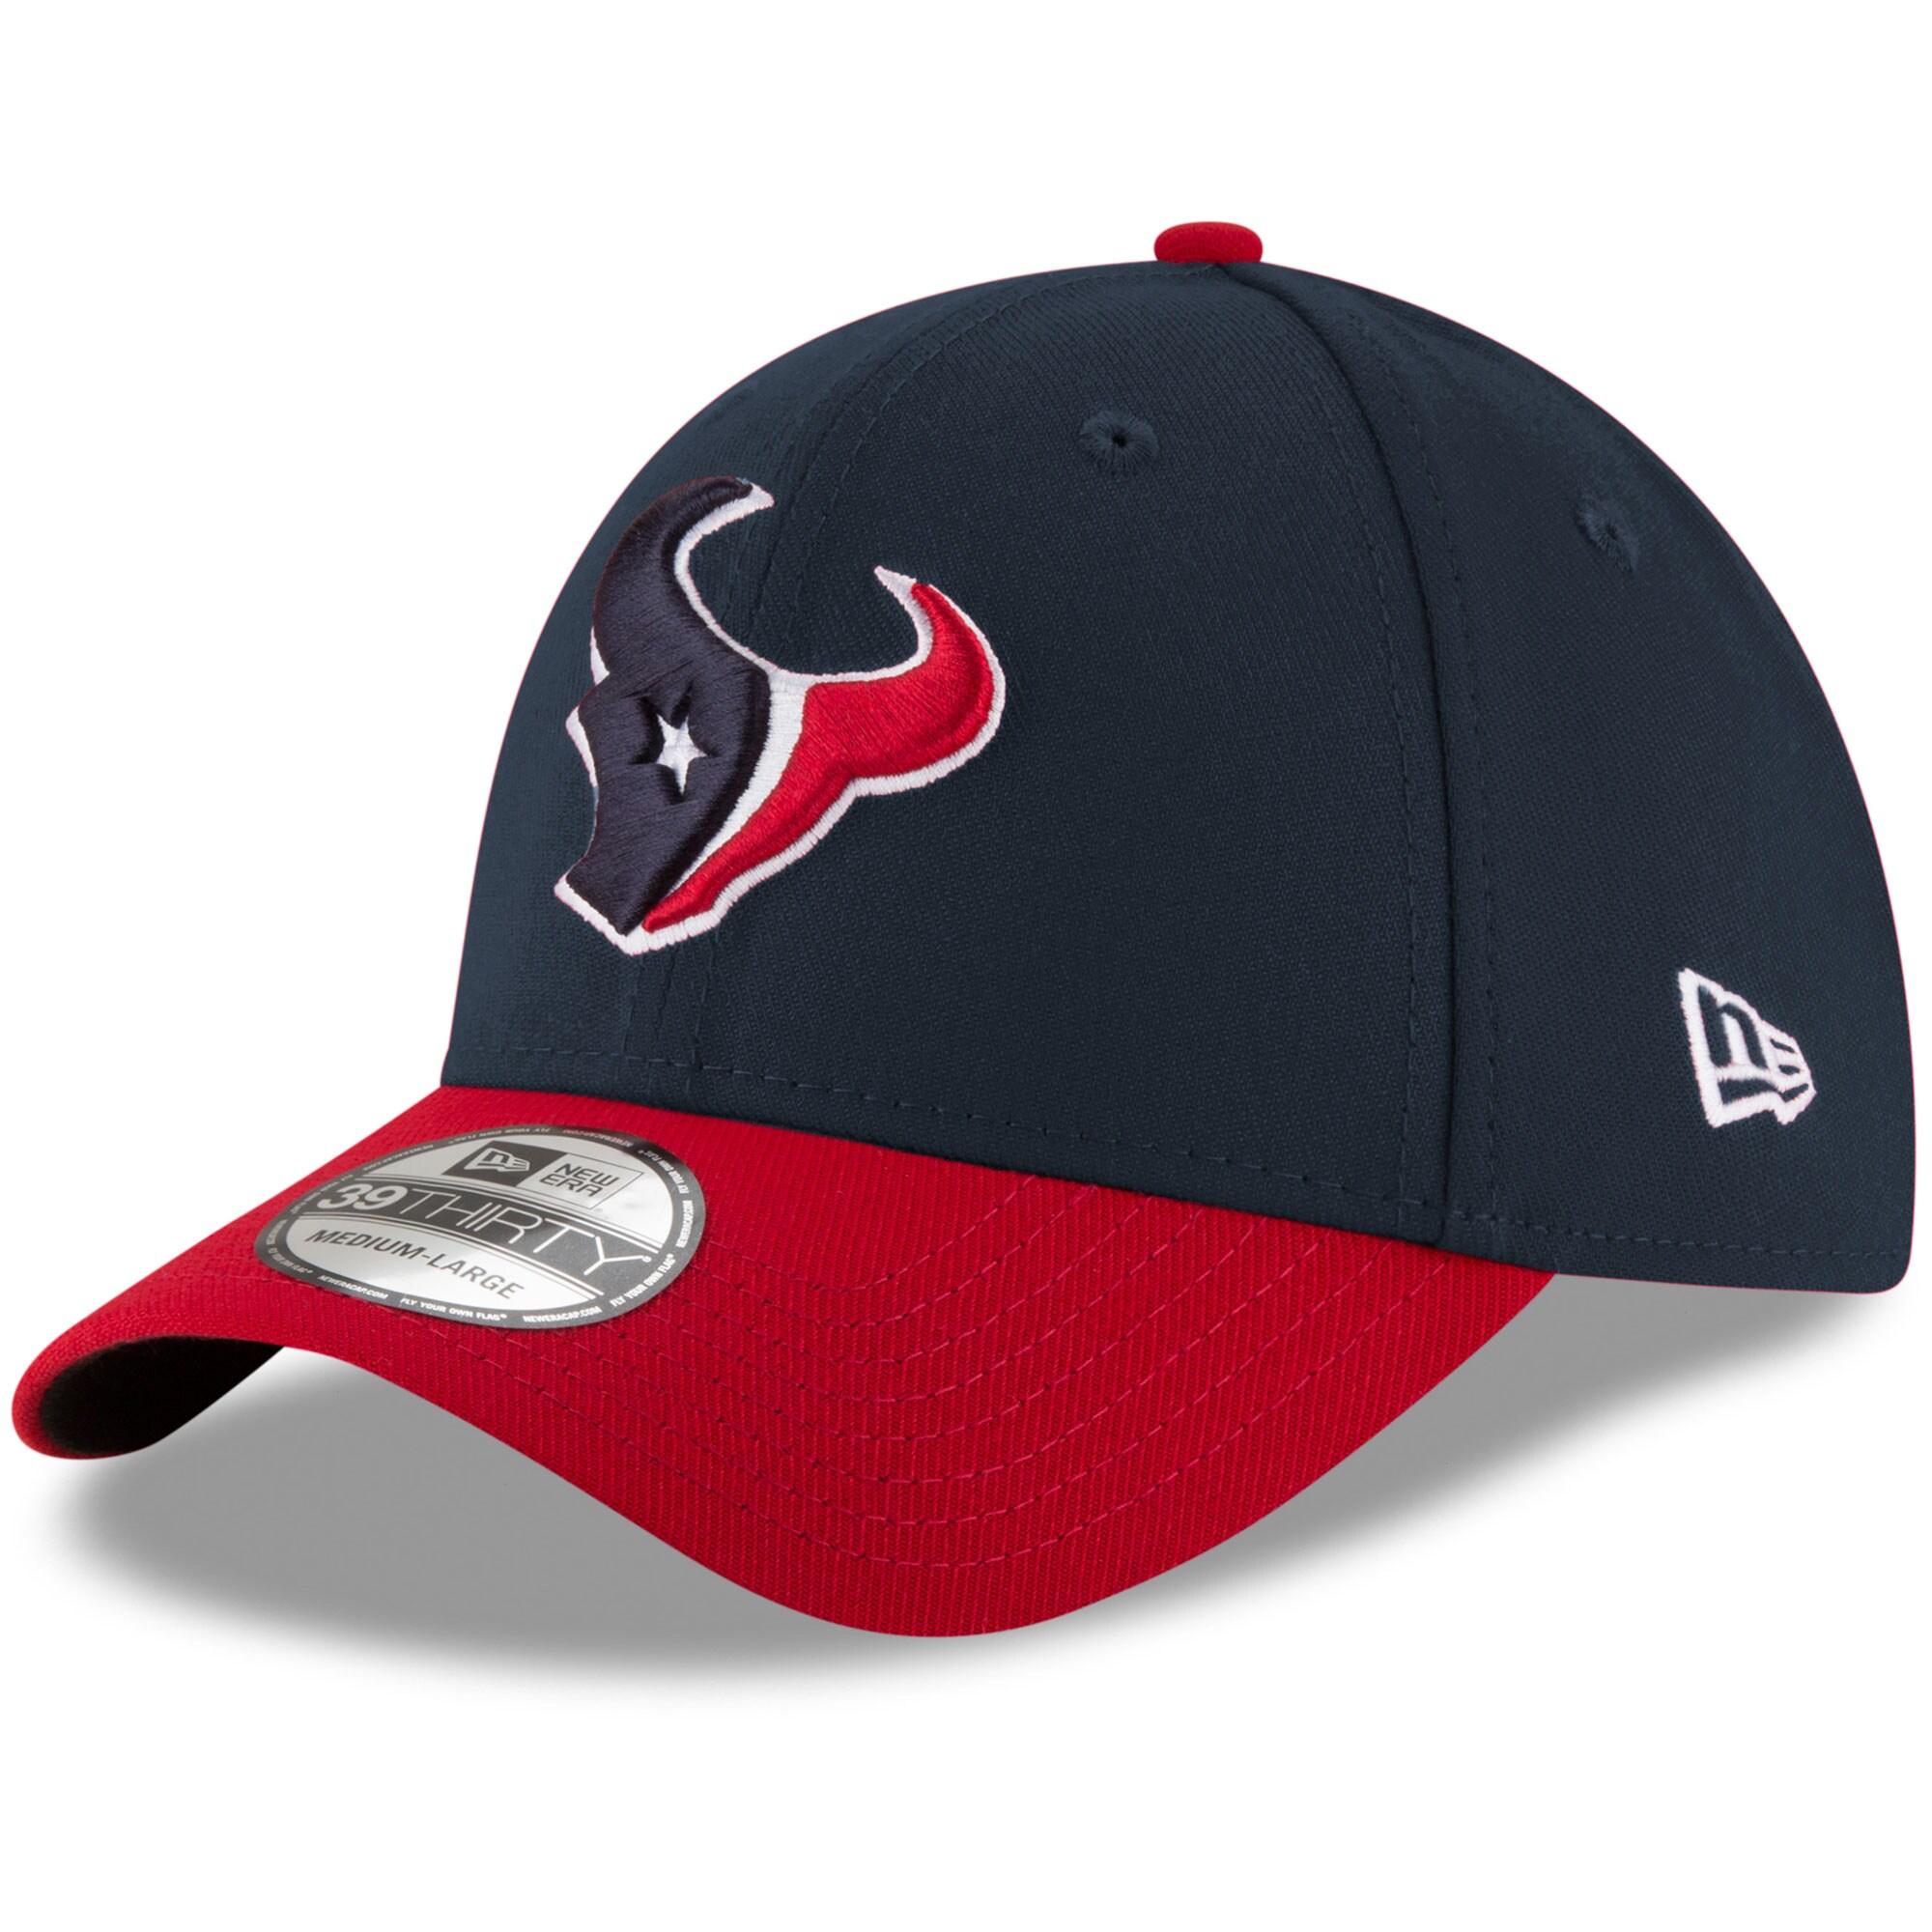 Houston Texans New Era Team Classic Two-Tone 39THIRTY Flex Hat - Navy/Red